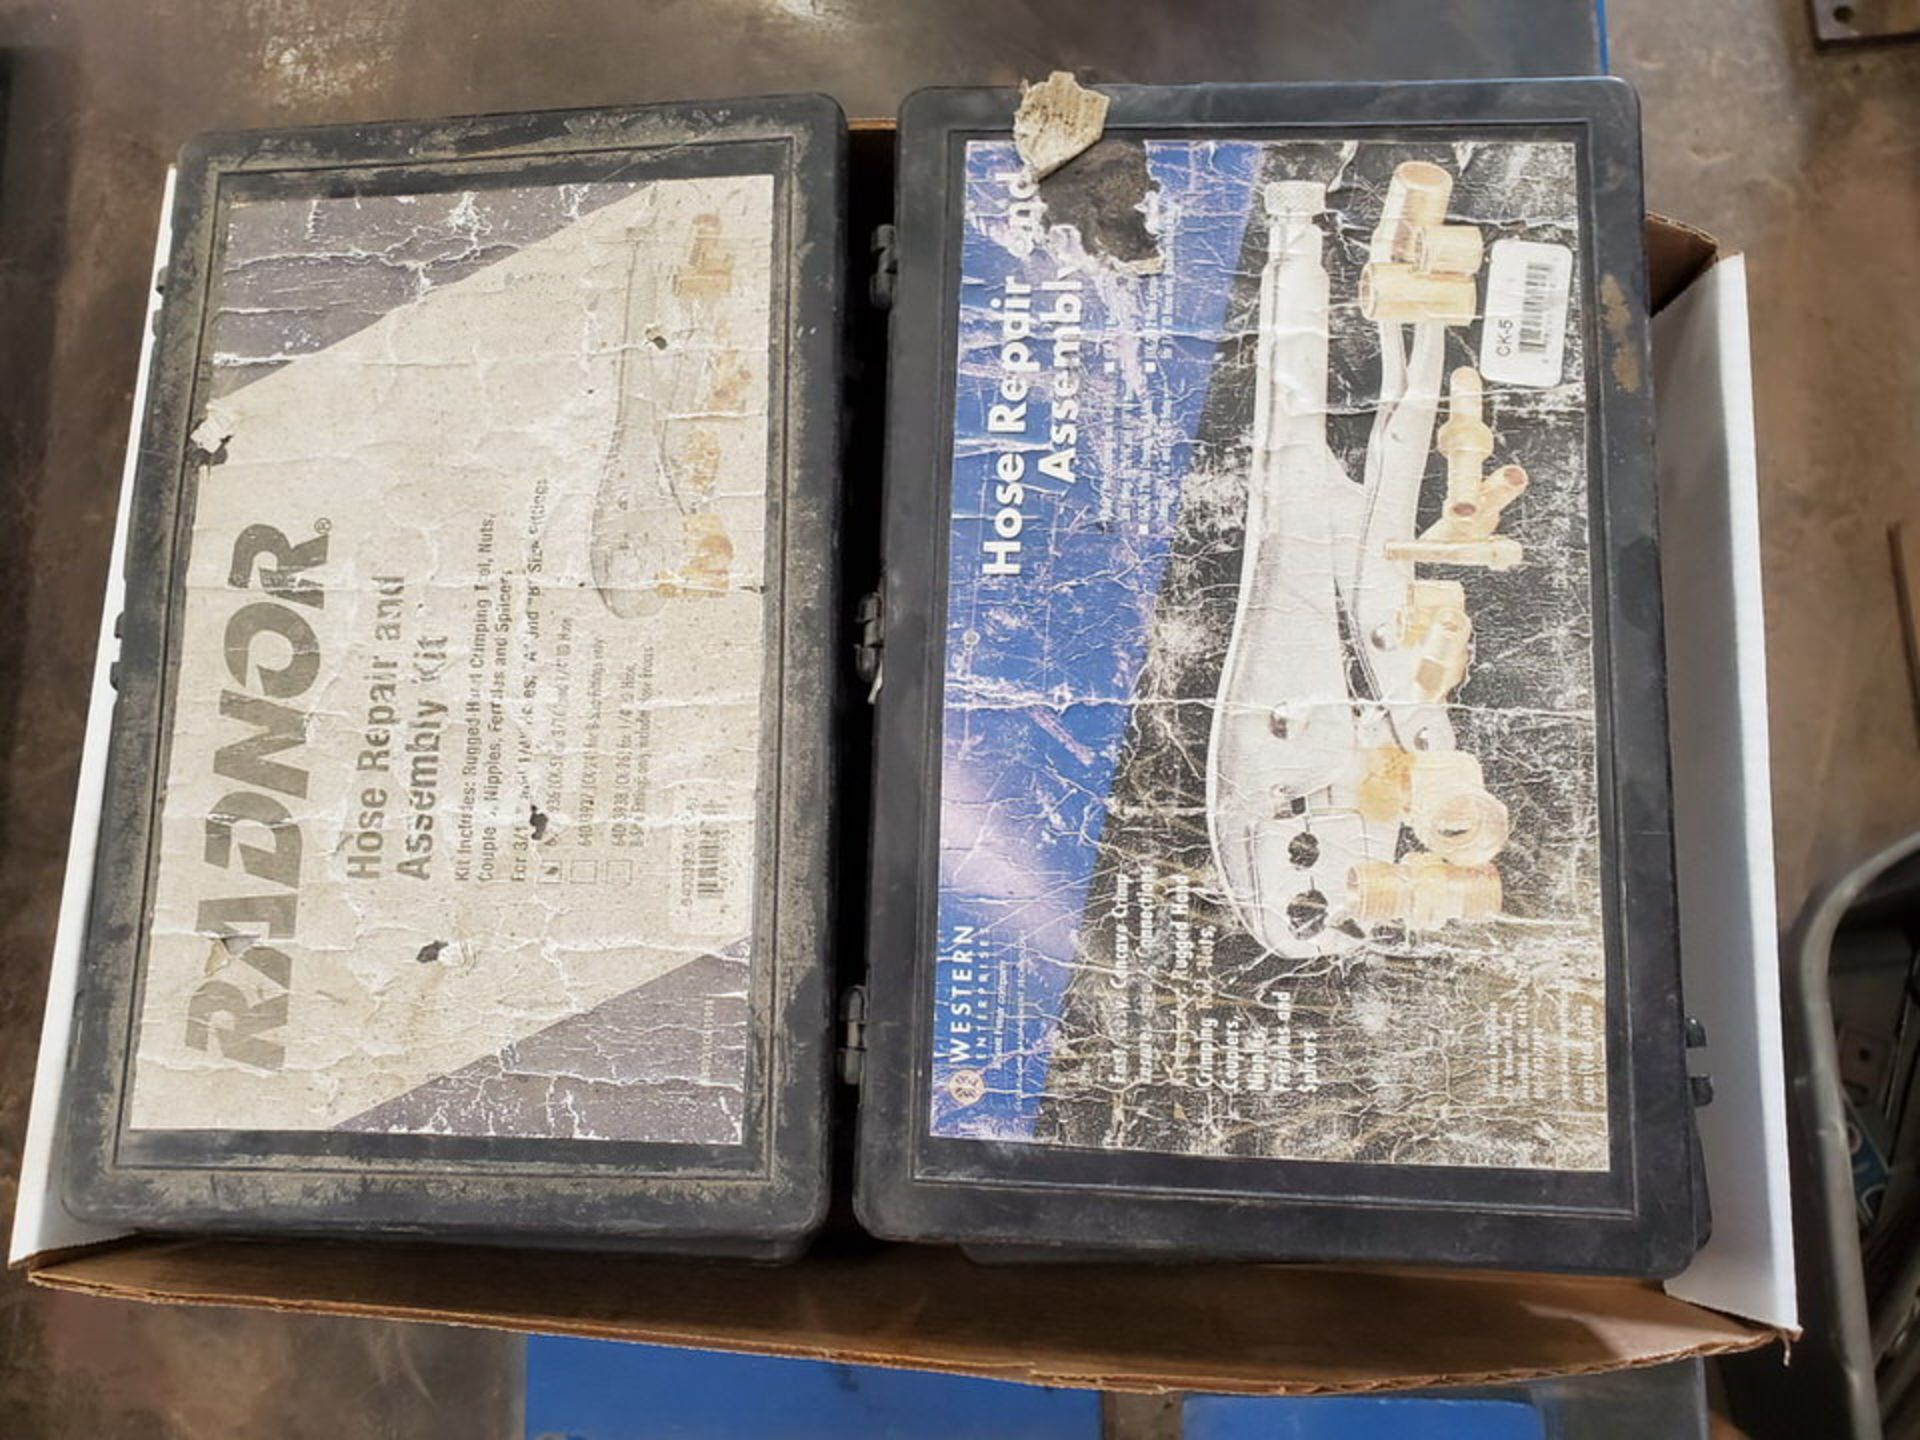 Radnor & Frostar (7) Hose Repair & Assy Kits - Image 3 of 4